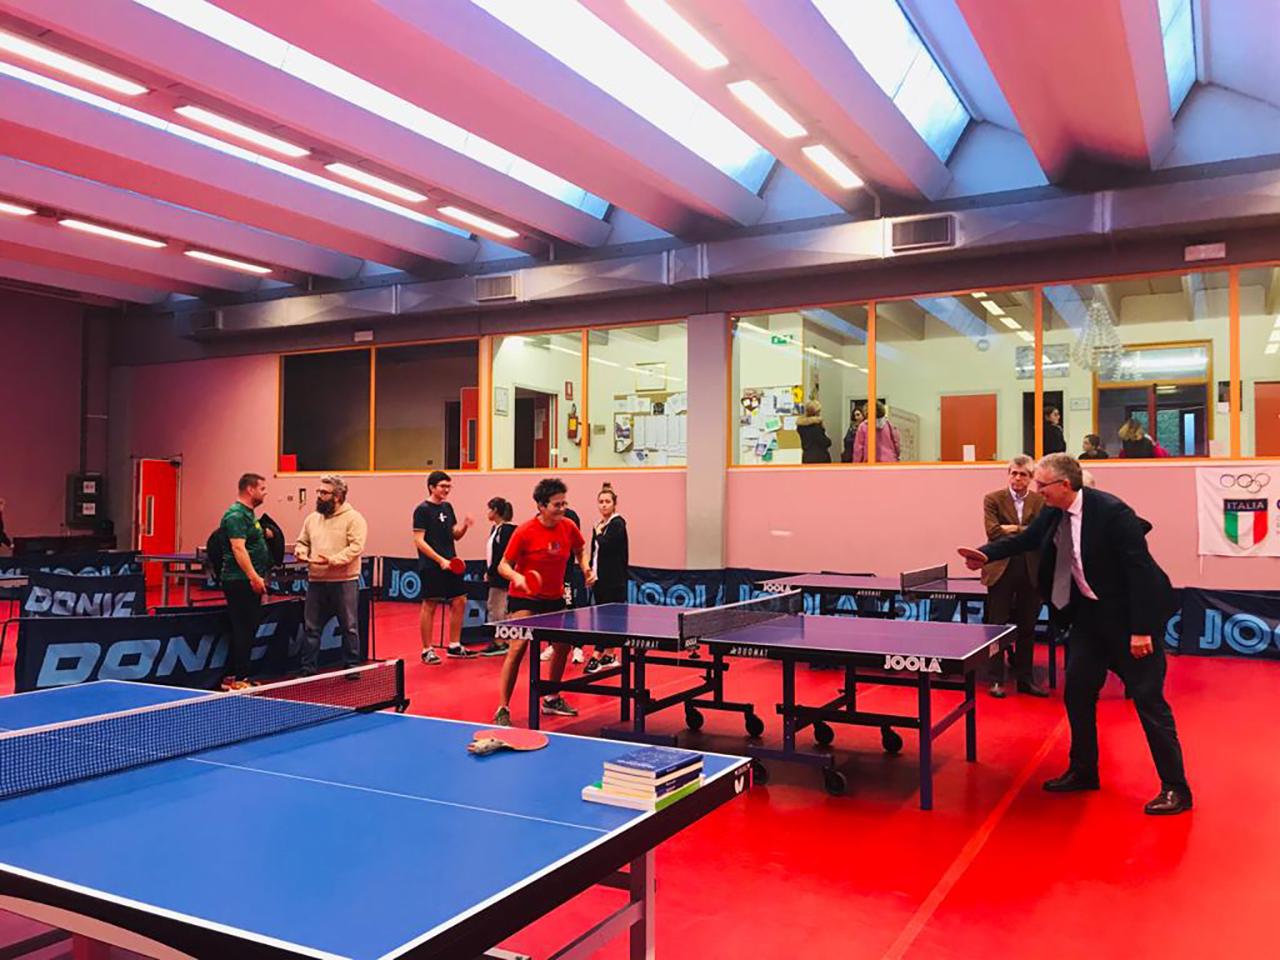 Sabrina Moretti sfida a ping pong il presidente Luca Ceriscioli